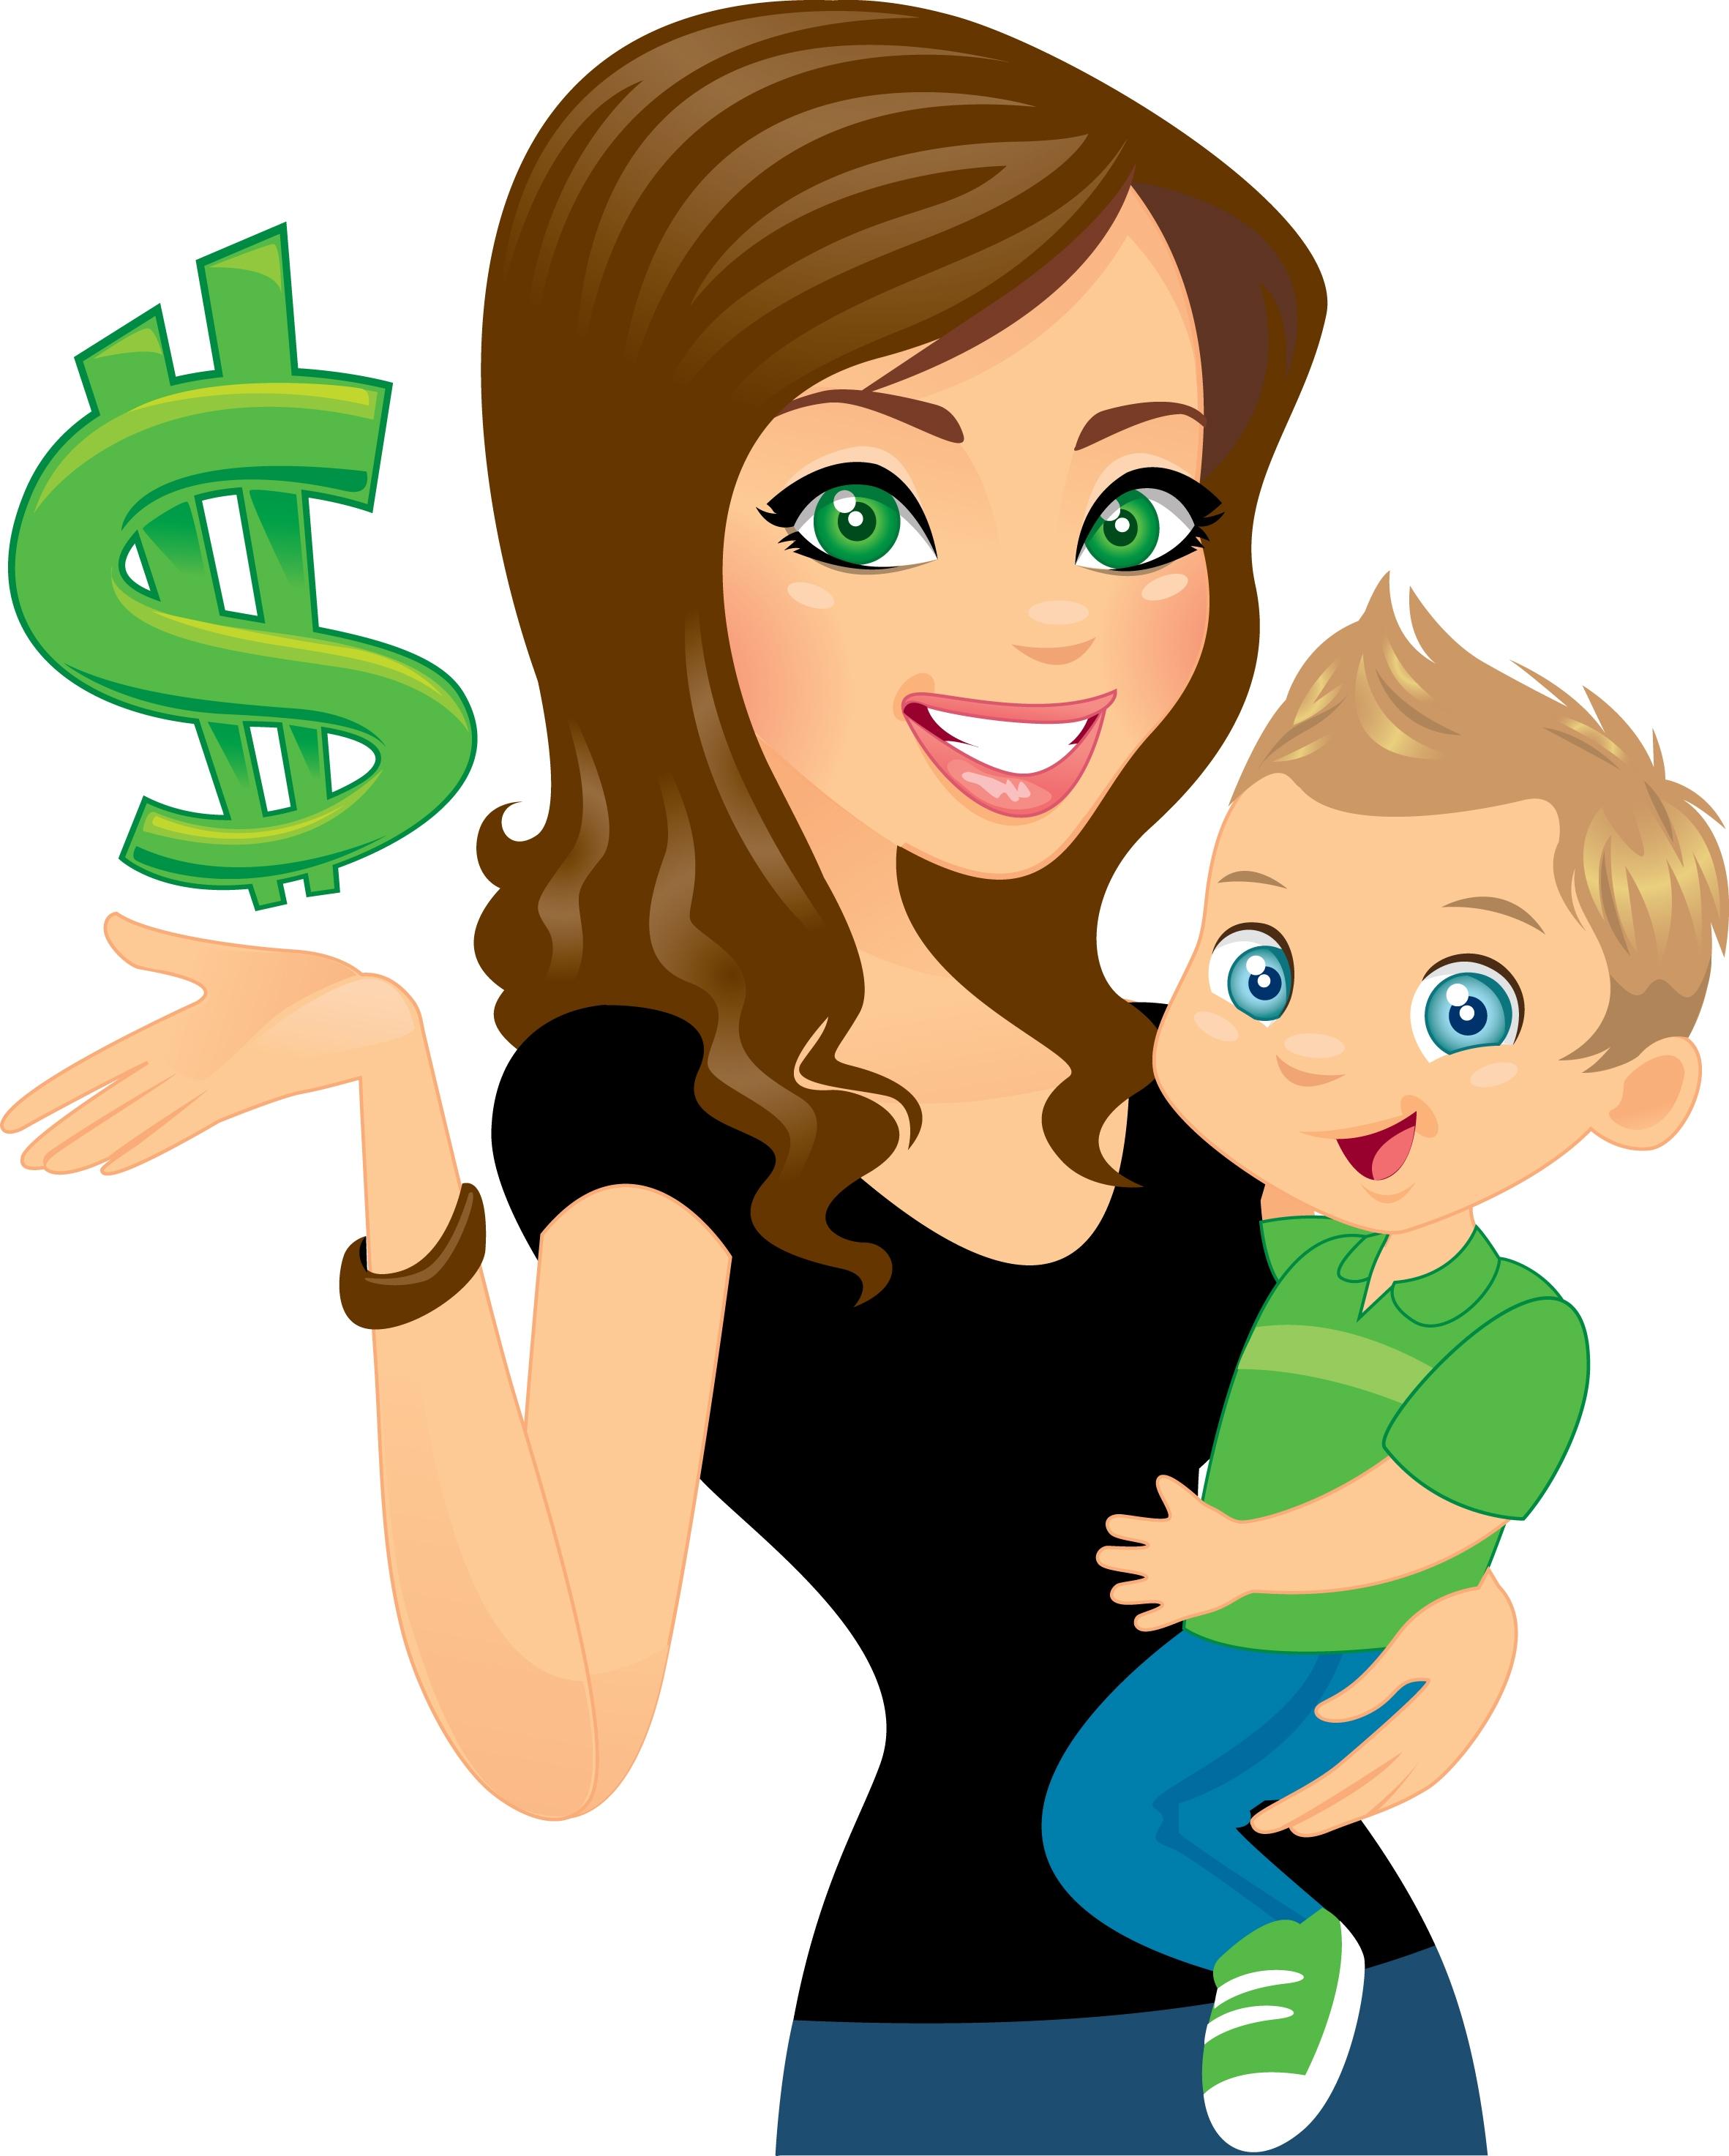 Babysitting clipart mom toddler. Unusual inspiration ideas babysitter